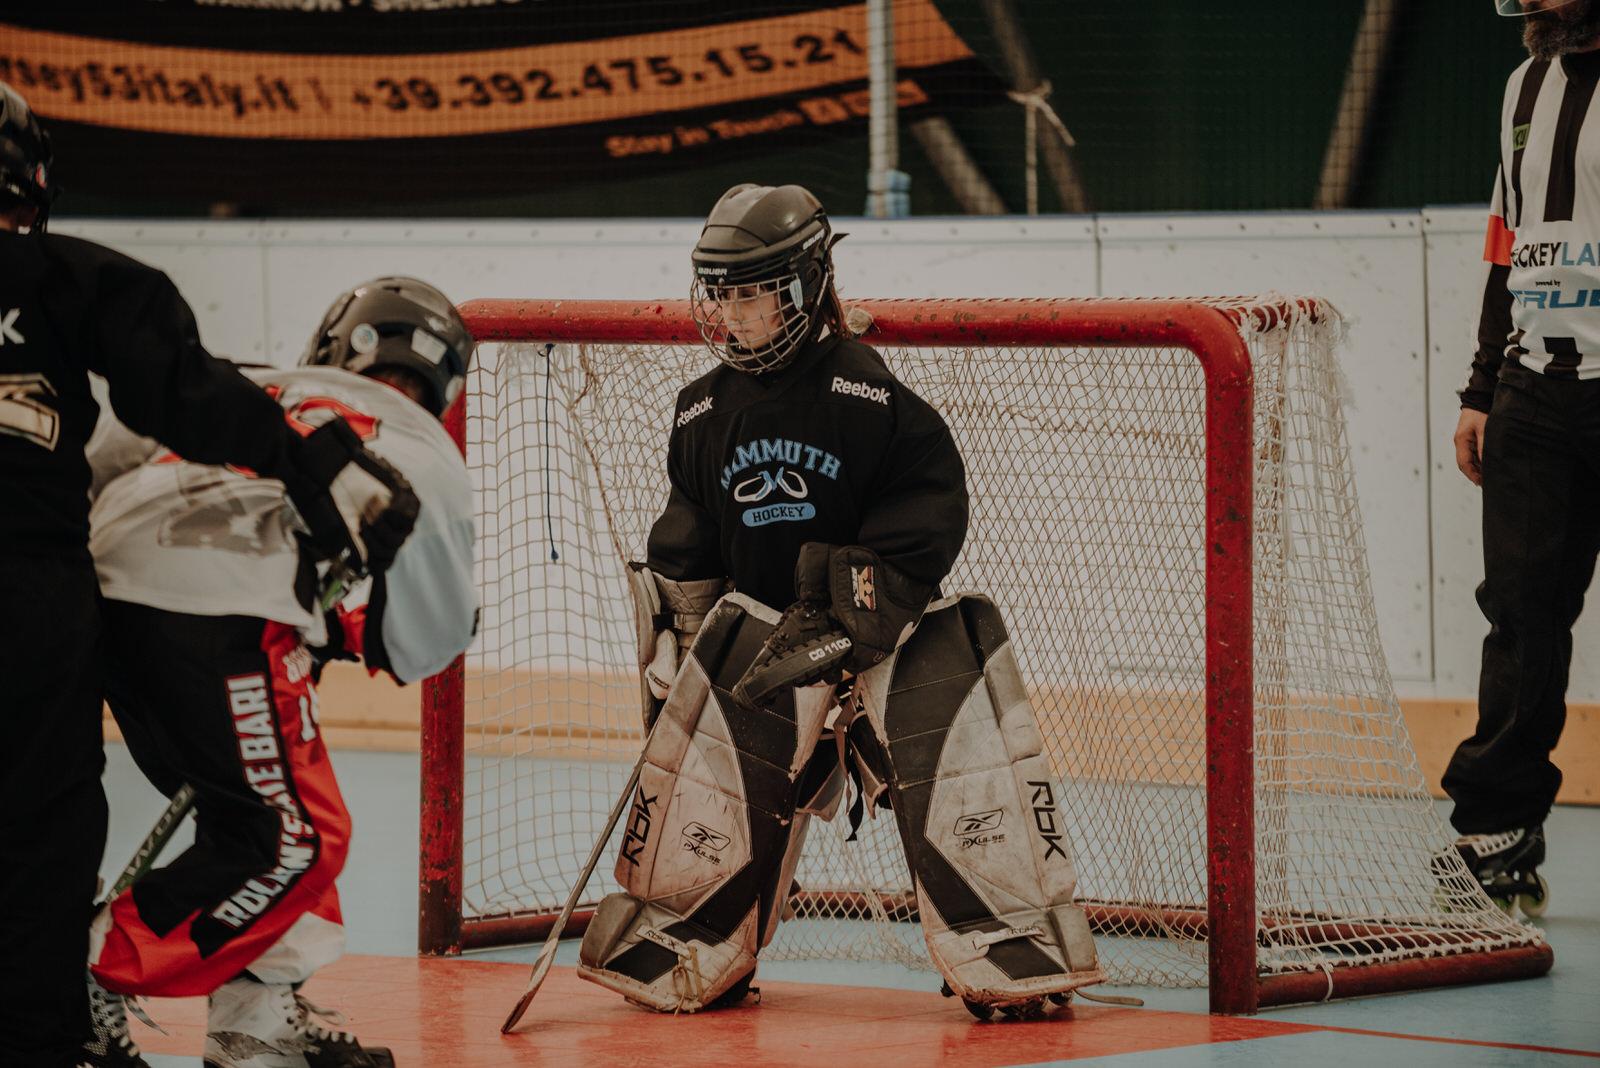 mammuth hockey, hockey inline, inline hockey, roma hockey, hockey roma, giovanili hockey, giovanili roma, sport giovanili roma, hockey giovanile roma